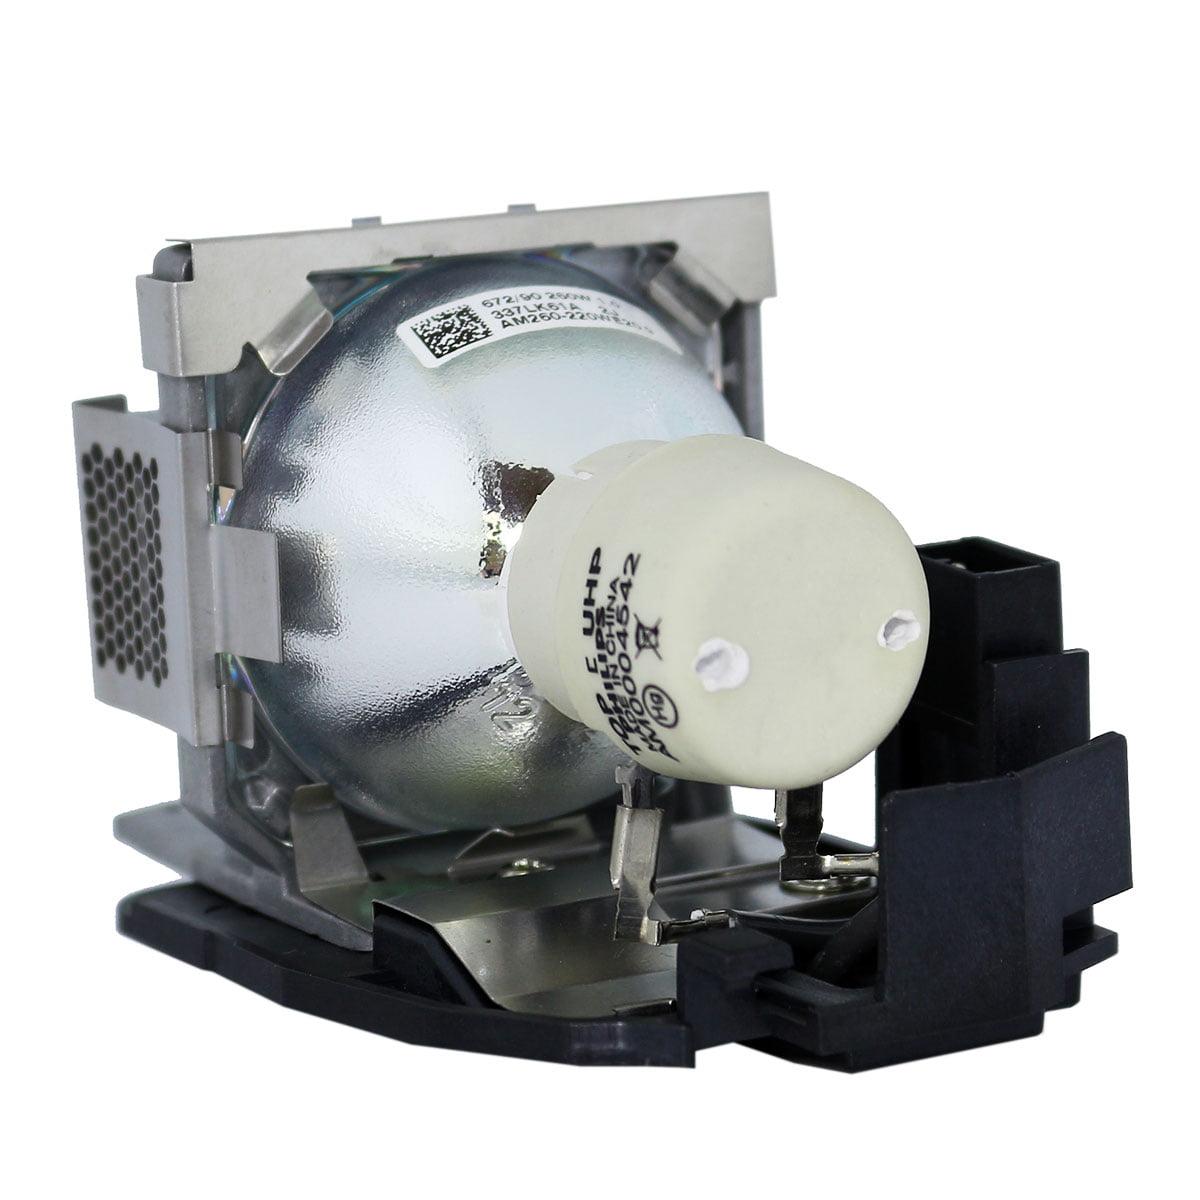 Lutema Platinum Bulb for BenQ MP711c Projector Lamp (Original Philips Inside) - image 3 of 5